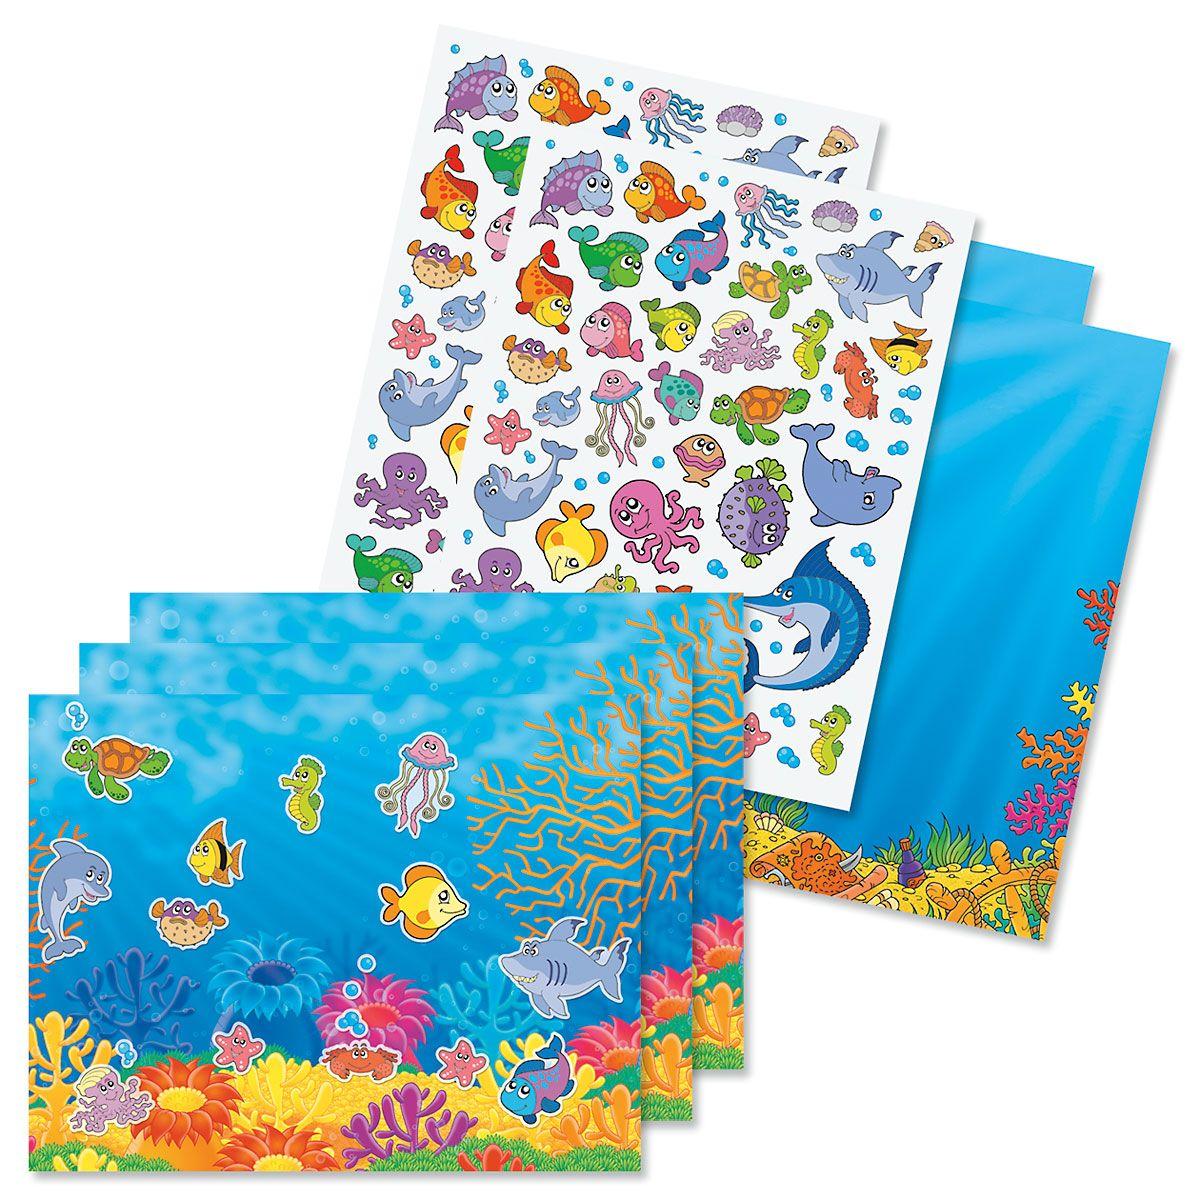 Ocean Adventure Background Scenes and Stickers